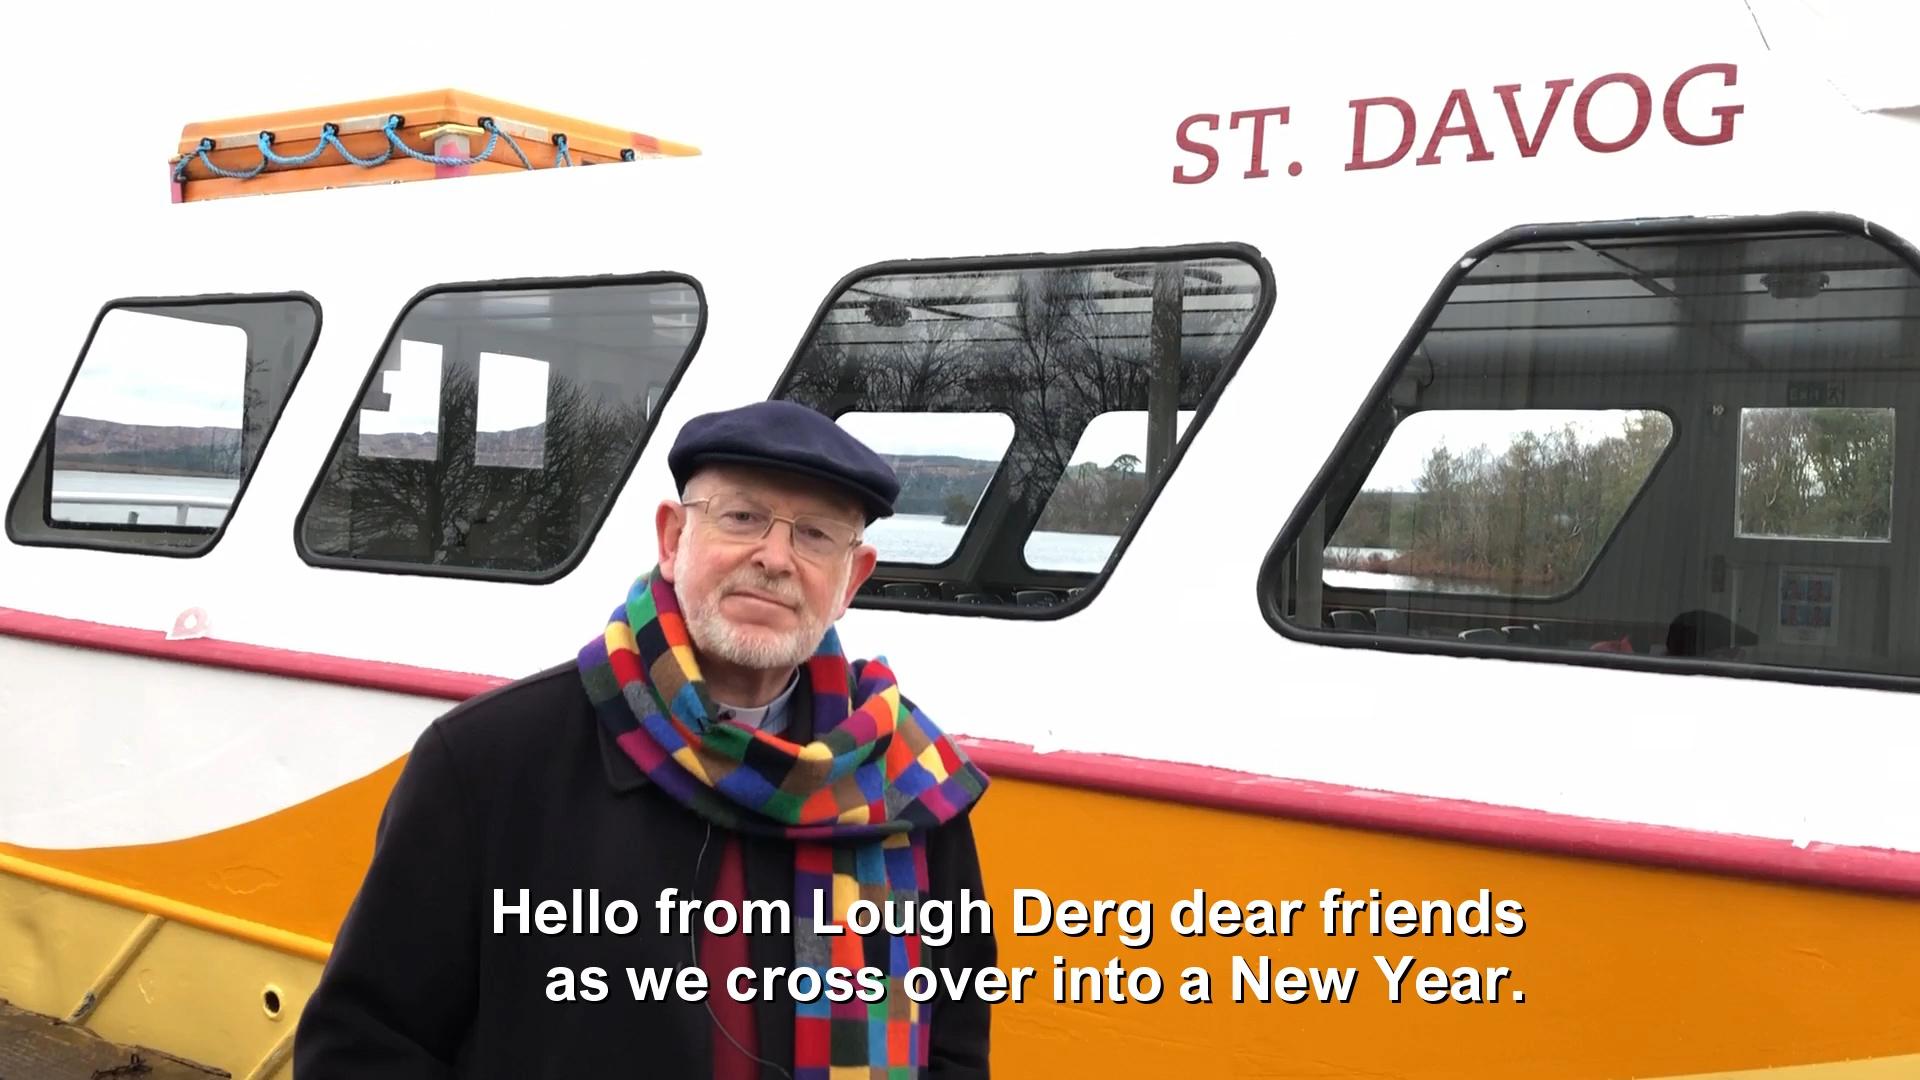 Lough Derg New Year Message 2020